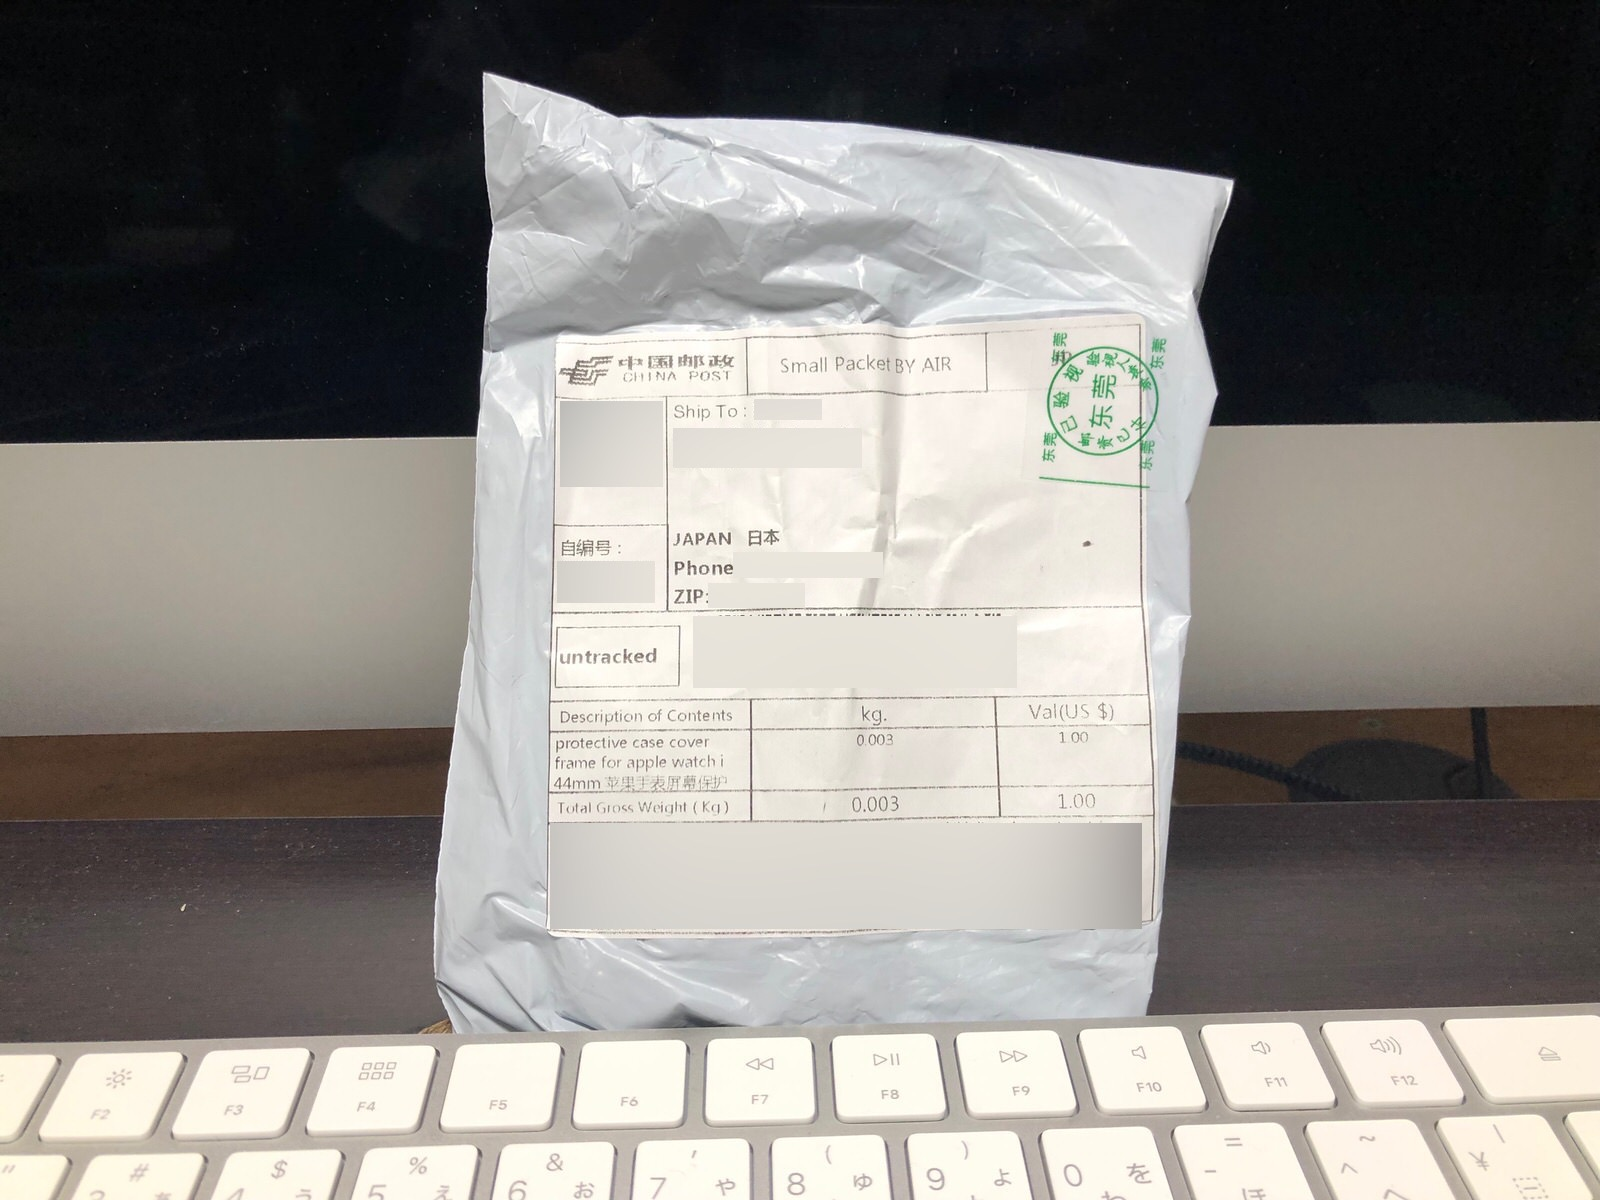 casualcatch Apple watch4 ケース 保護ケース カバー PCケース 傷を防止 防塵 耐衝撃性 44mm−1